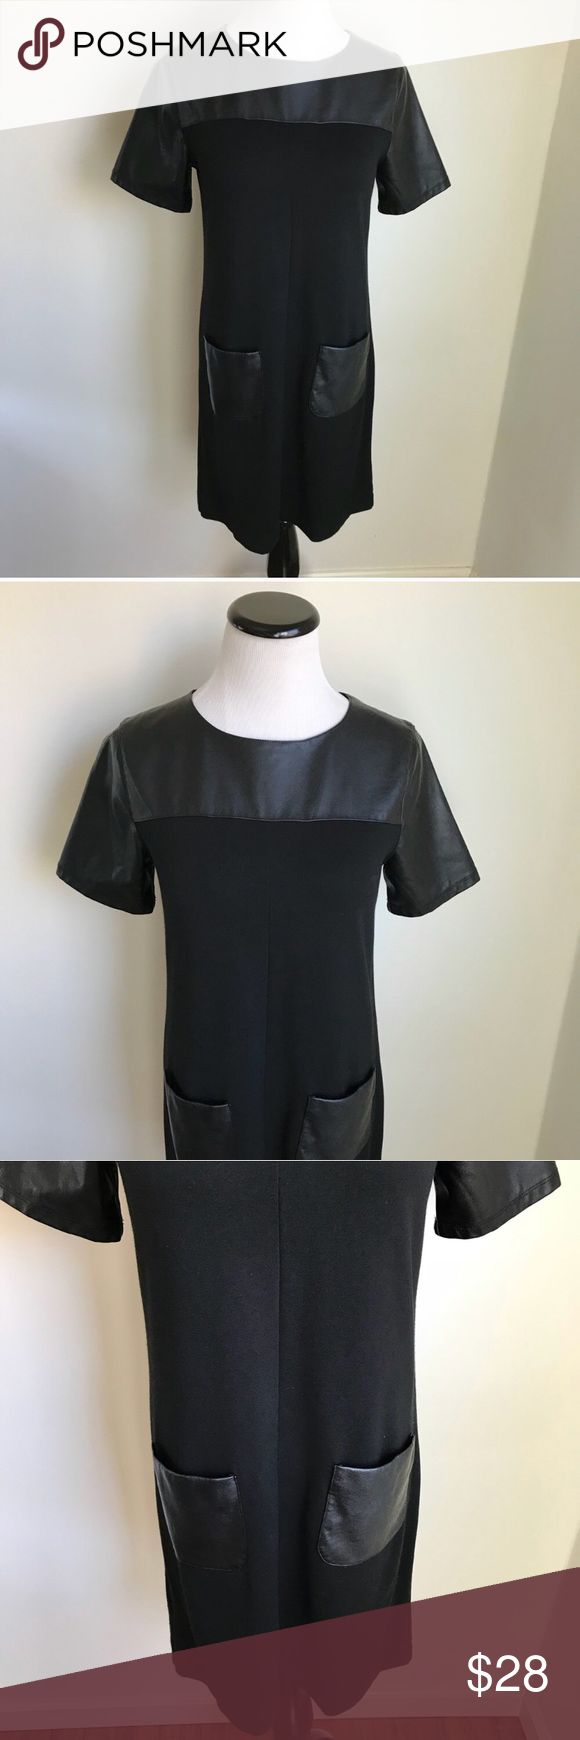 Anne Taylor Loft Black Vegan Leather Shift Dress Anne Taylor Loft Black Vegan Leather Shift Dress Measurements laying flat:  Underarm to underarm- 17 Total length- 33   bin 8 LOFT Dresses Mini